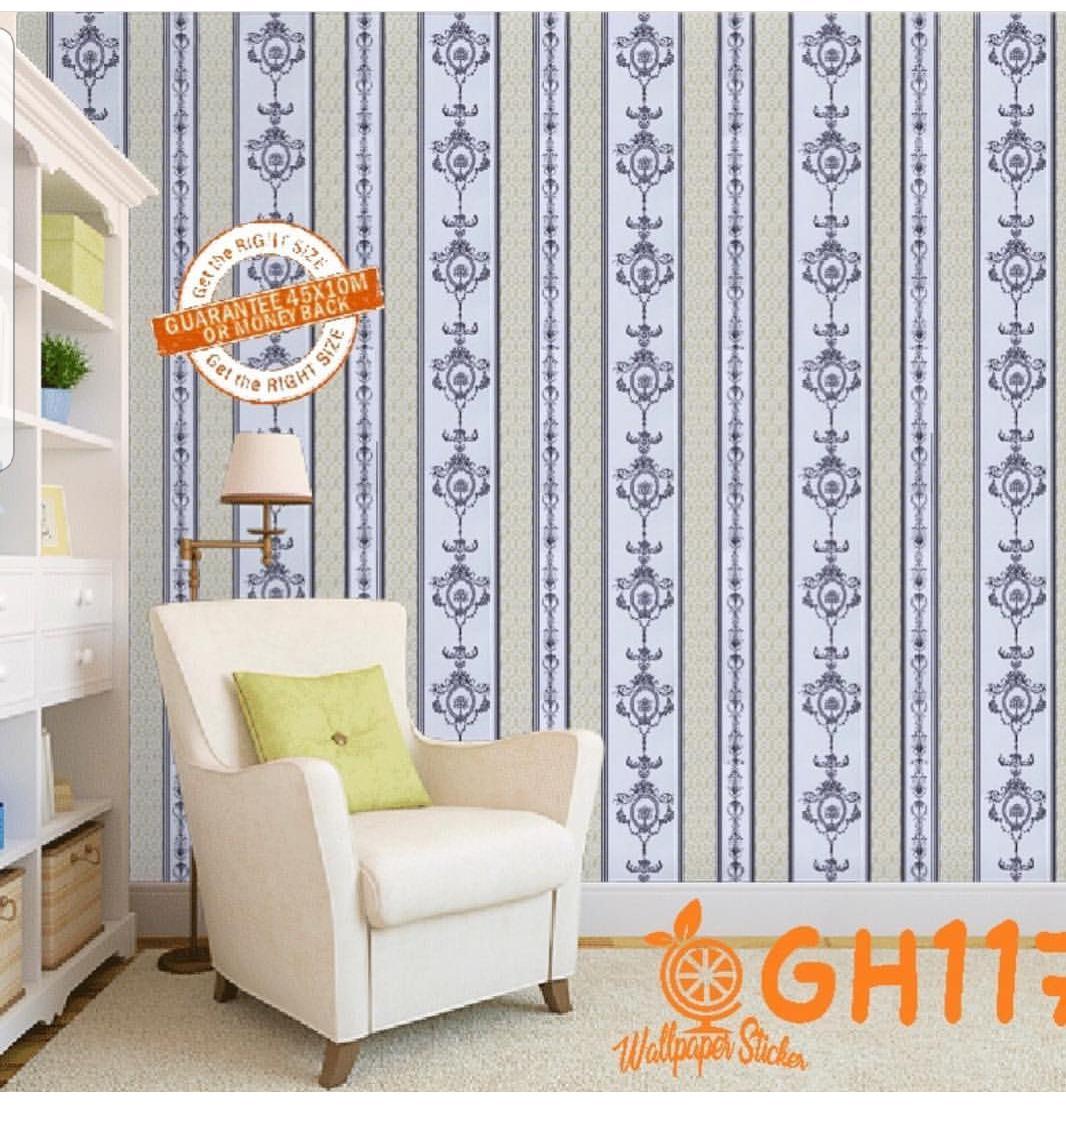 Stiker Wallpaper Dinding - Elegant Wallpaper Sticker (Size 45cm X 10M)